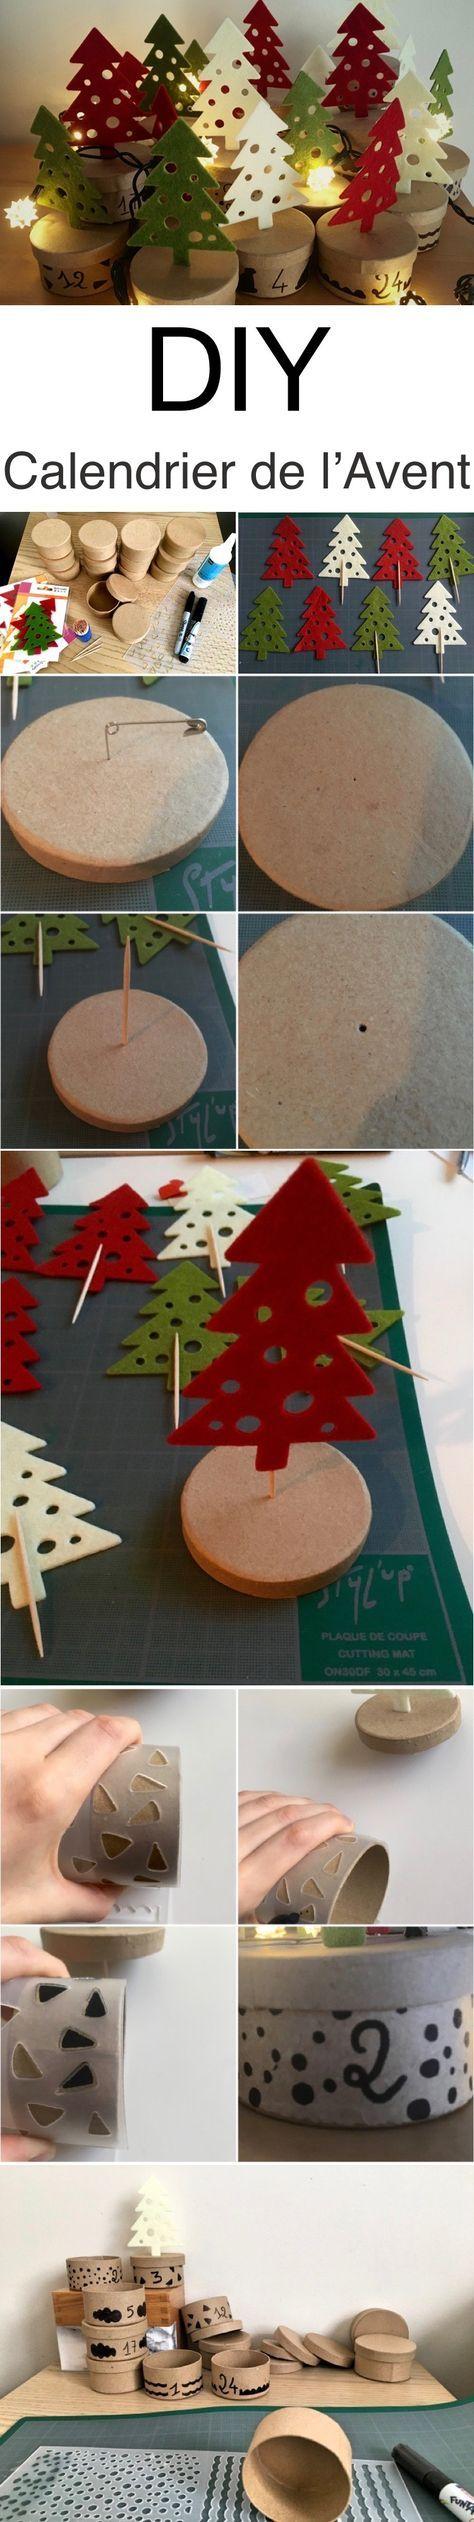 Tuto DIY calendrier de l'Avent forêt de sapins - Clem Around The Corner